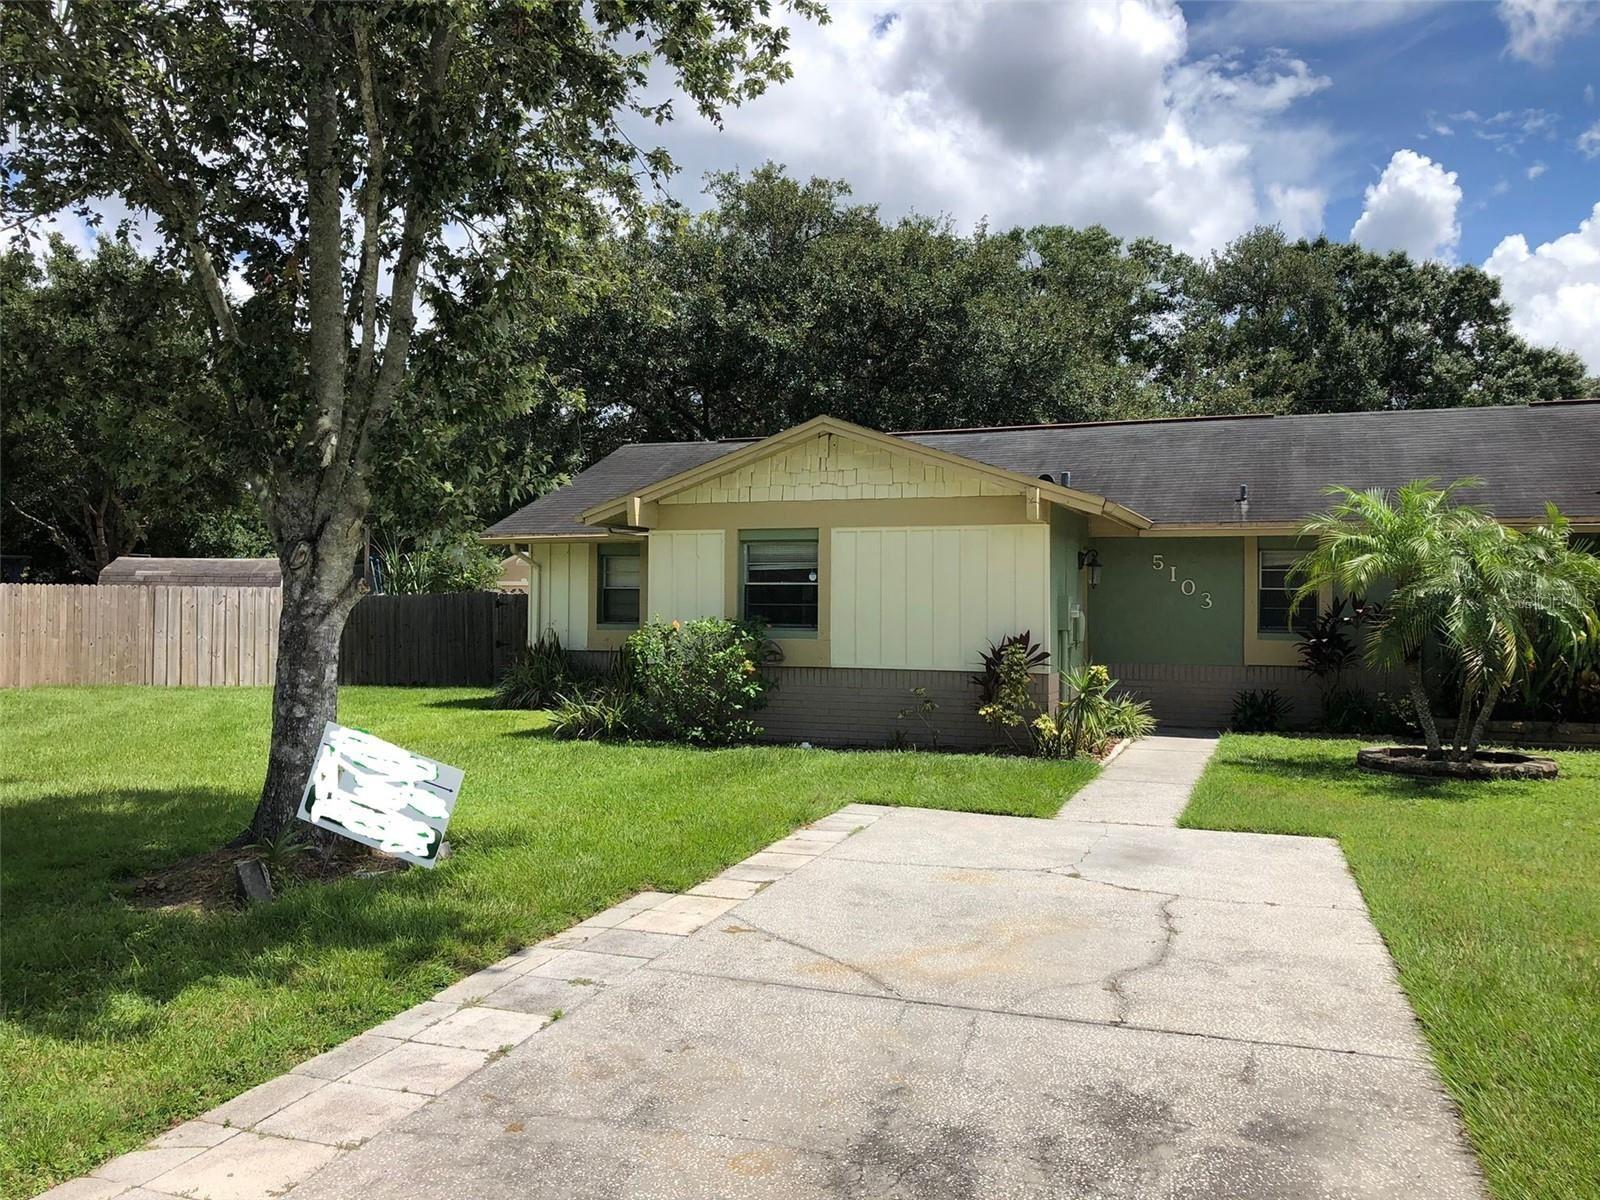 5103 LESHER COURT, Tampa, FL 33624 - MLS#: T3317743